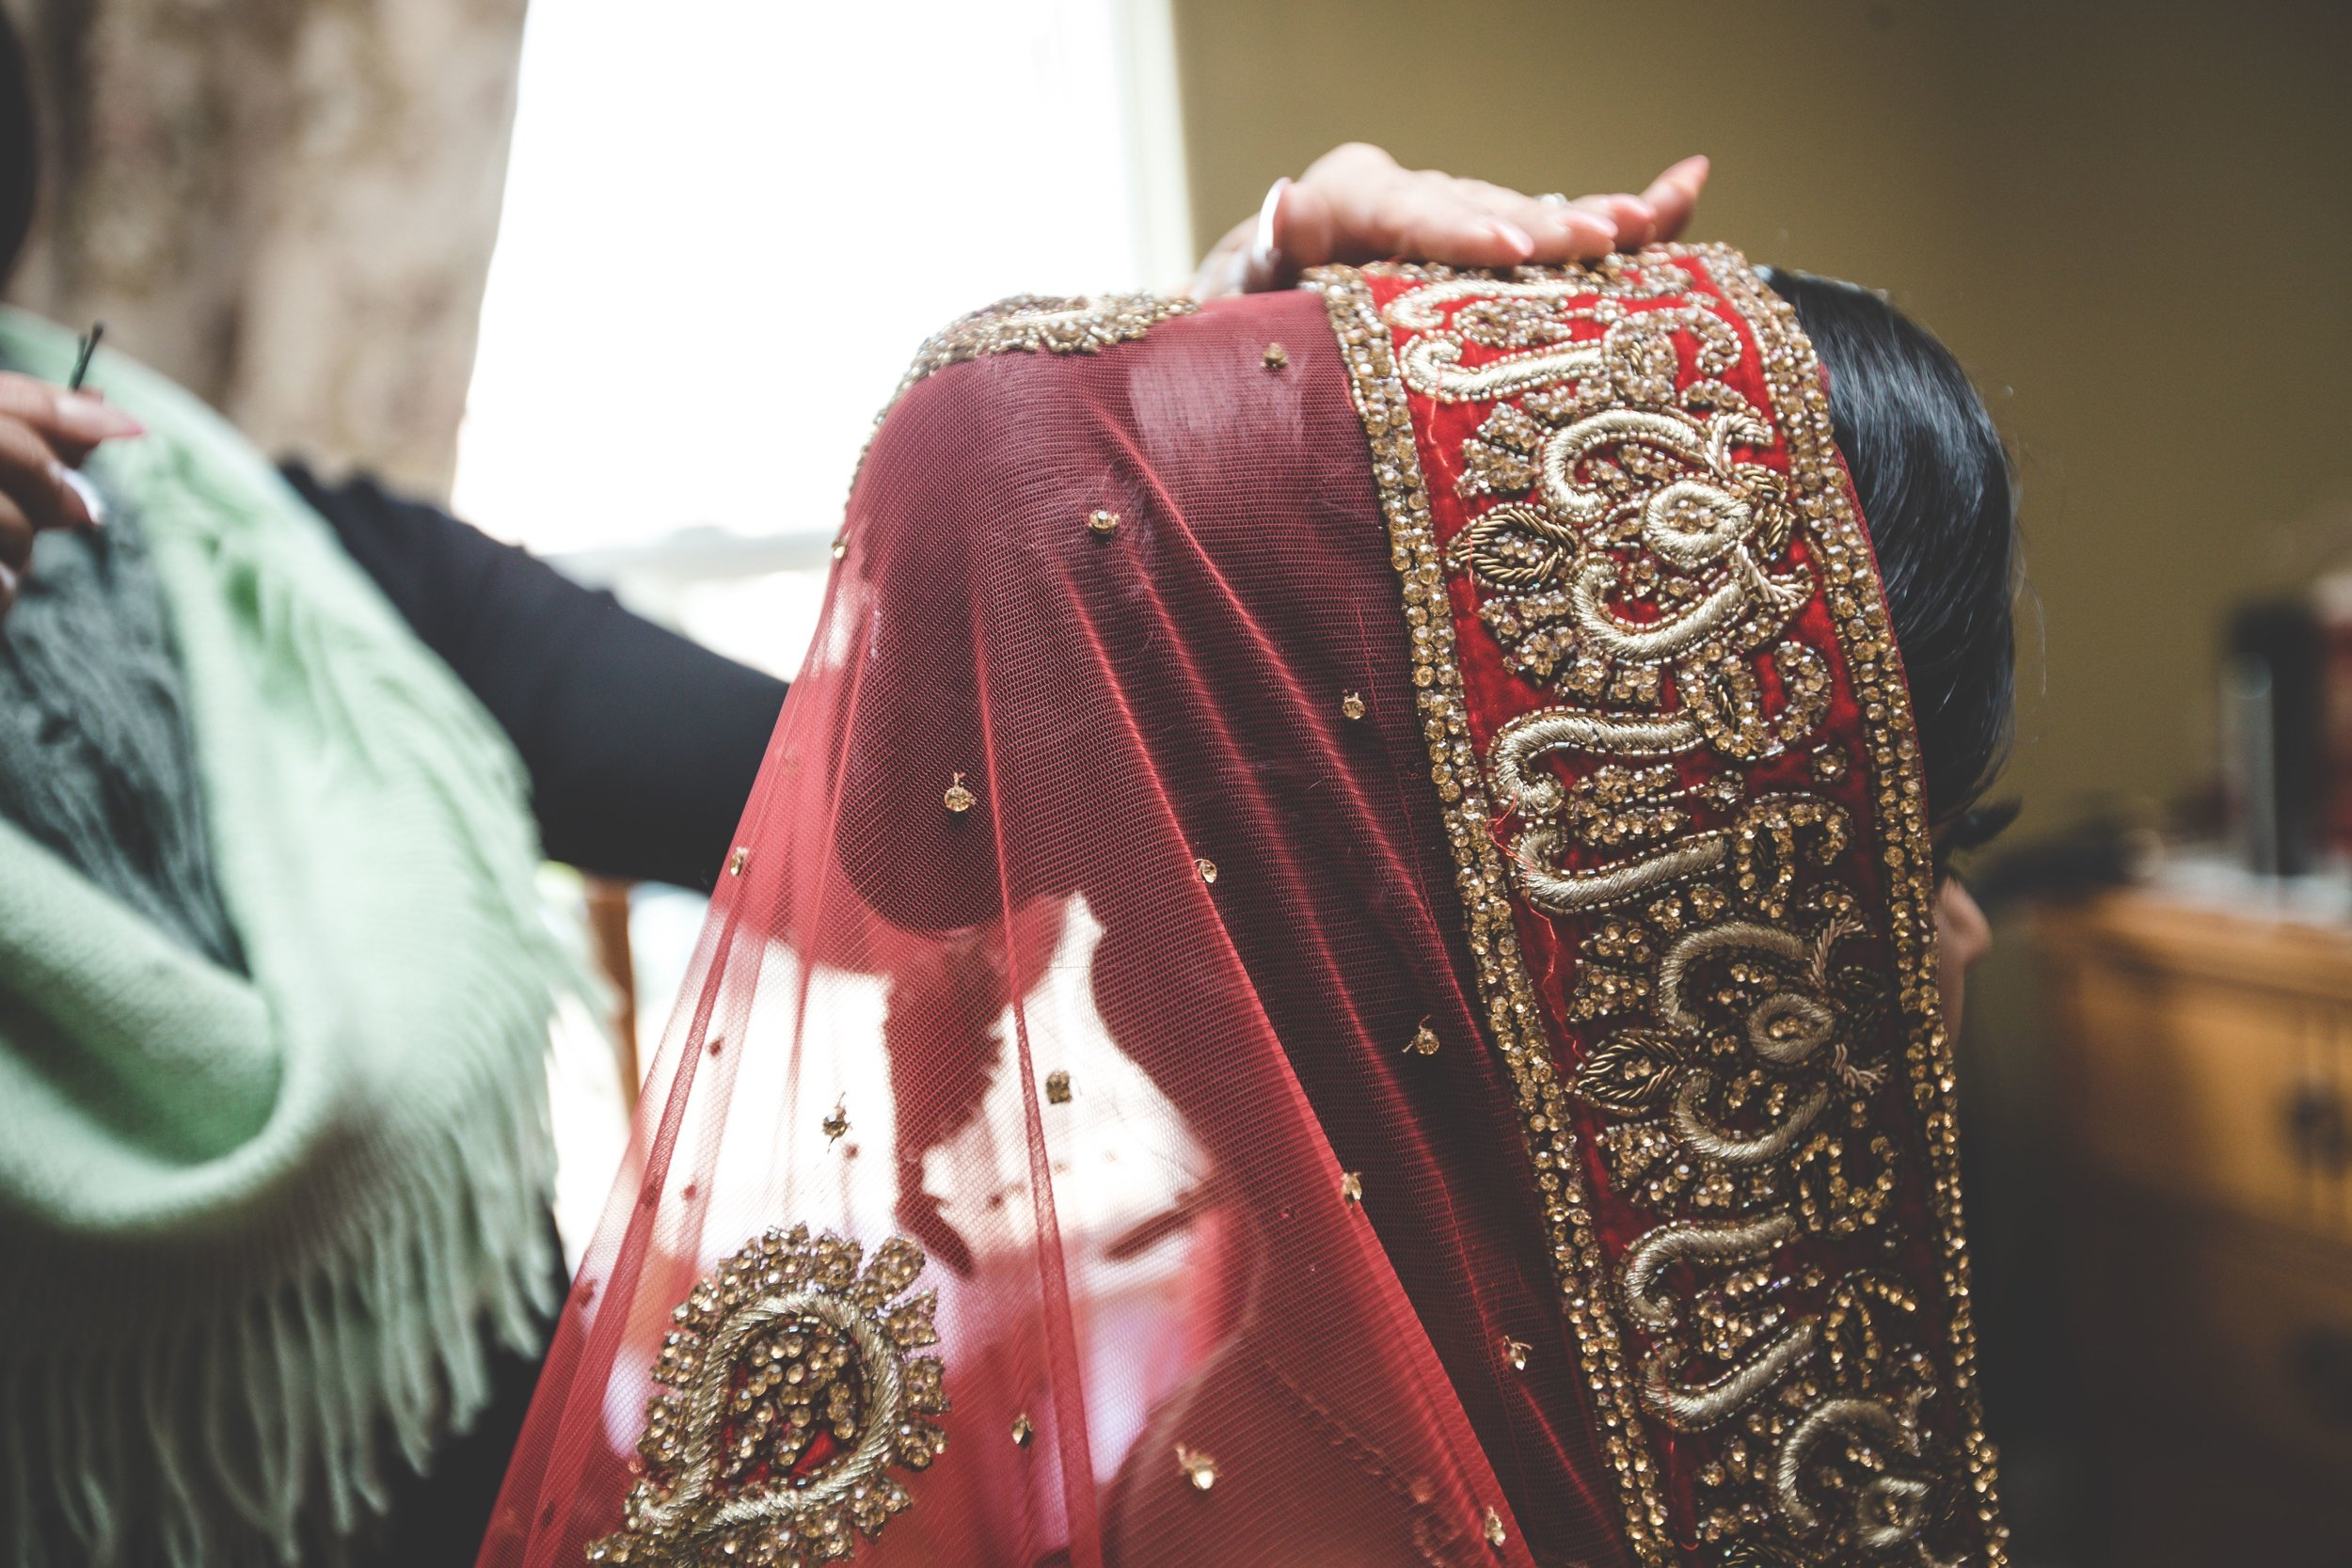 online125 Jatinder & Khushbir Wedding Day -  Groom & Bride Prep73.jpg